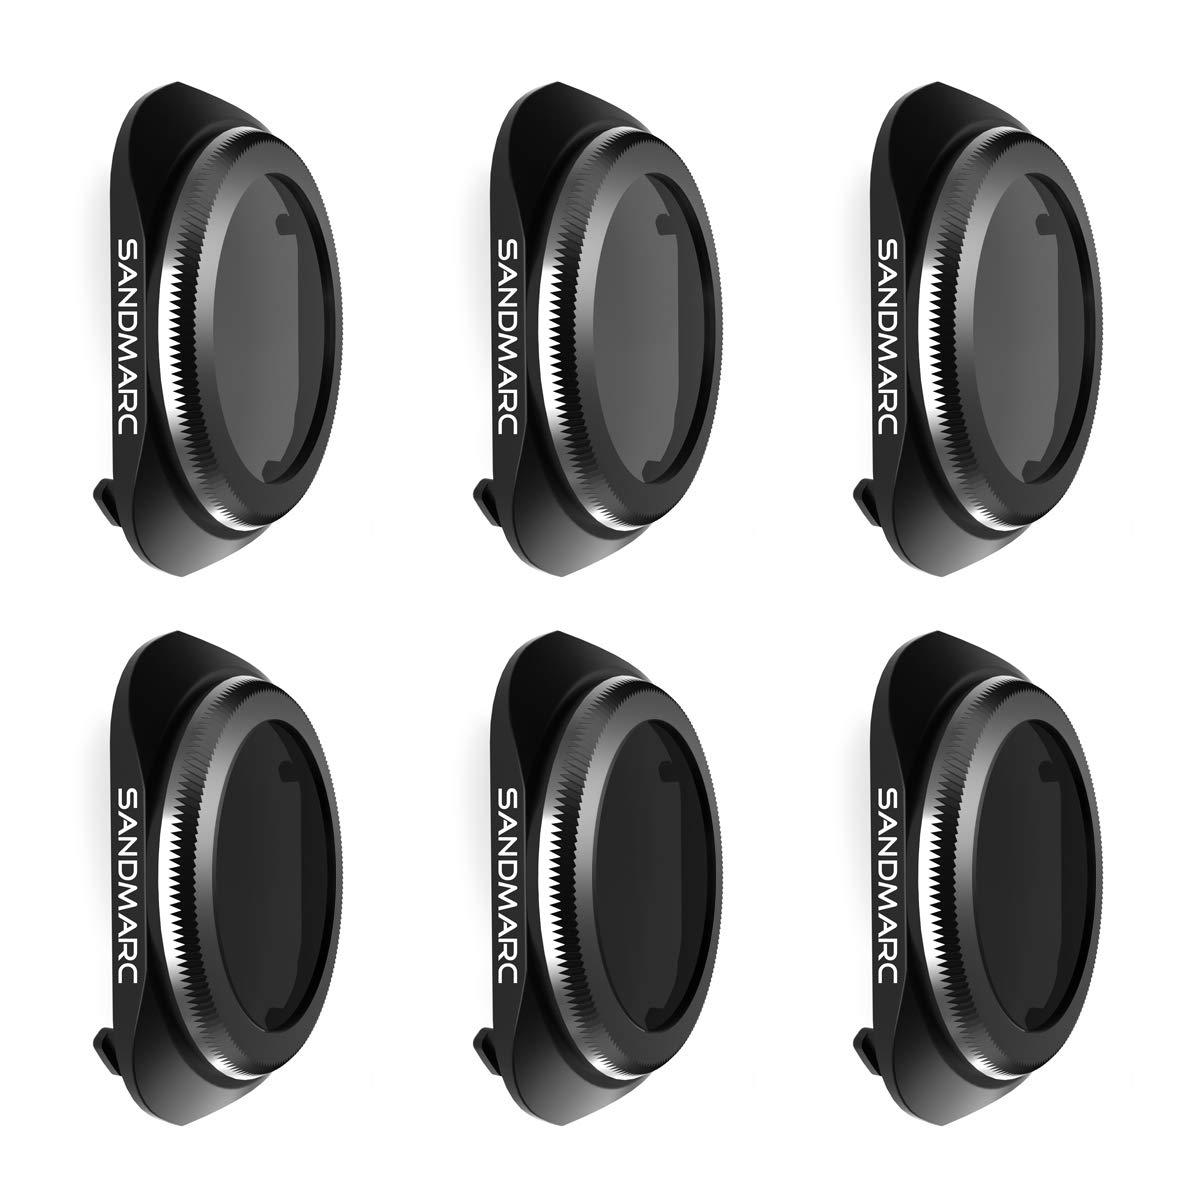 SANDMARC Pro Plus Filters for DJI Mavic 2 Pro (6-Pack) - PL, ND4/PL, ND8/PL, ND16/PL, ND32/PL & ND64/PL Filter Set by SANDMARC